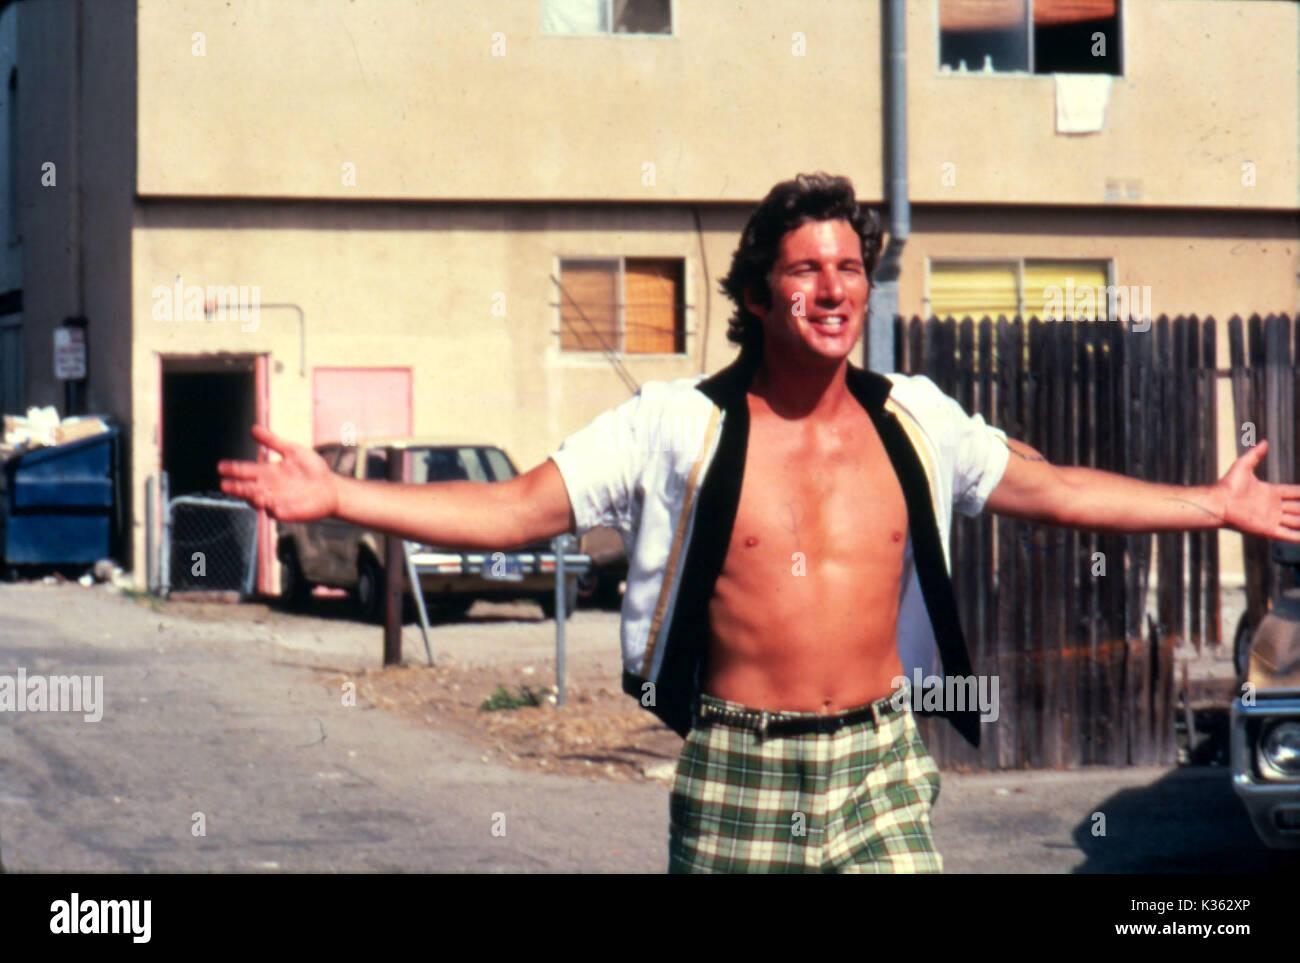 BREATHLESS RICHARD GERE     Date: 1983 - Stock Image